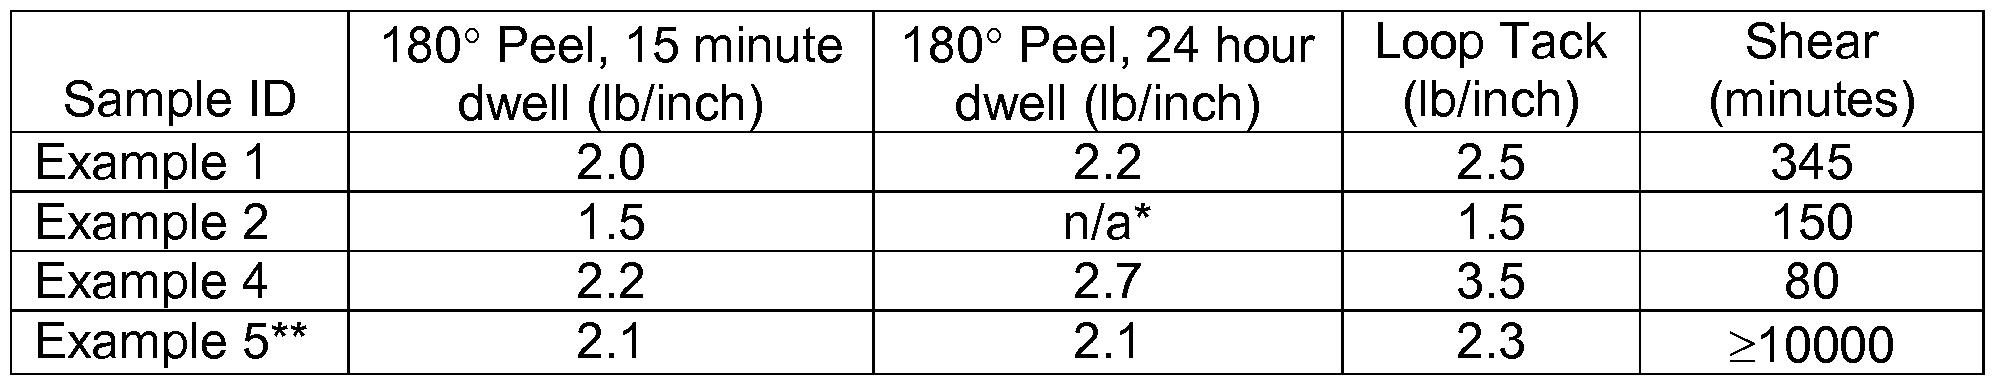 WO2016061110A1 - Vinyl acetate-ethylene / acrylic polymer emulsions